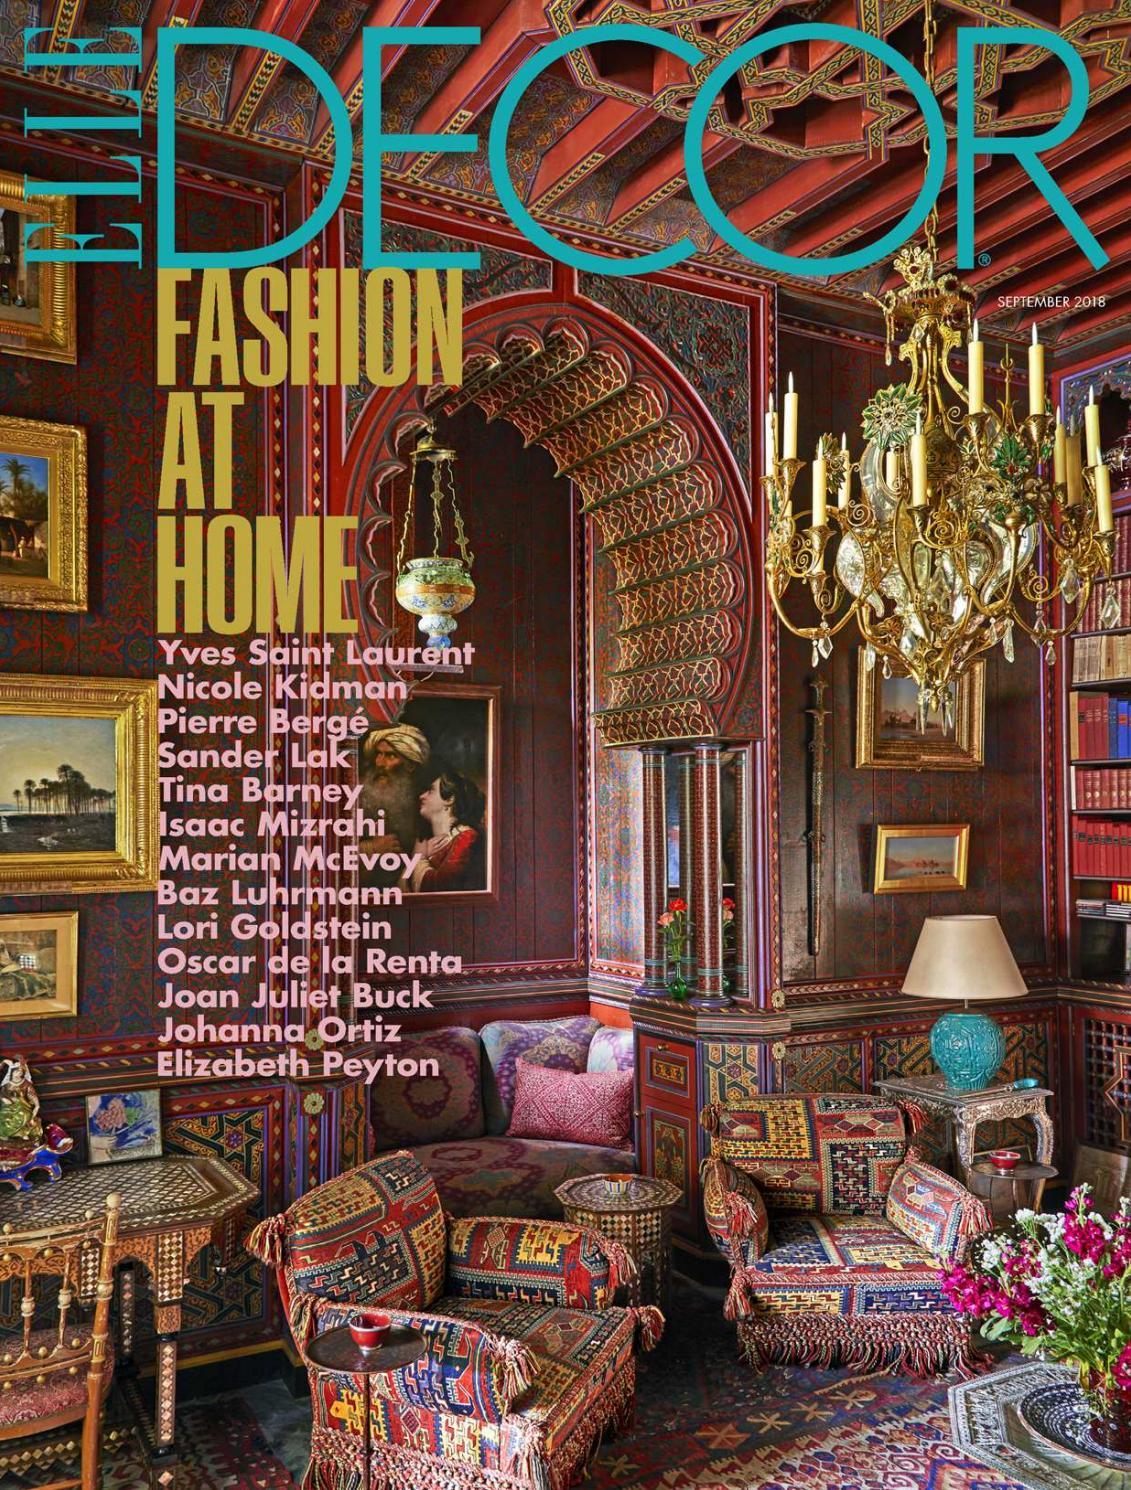 Wagon Bar Wall Decor.Decorator/'s Paradise 177i Room art French POSTER